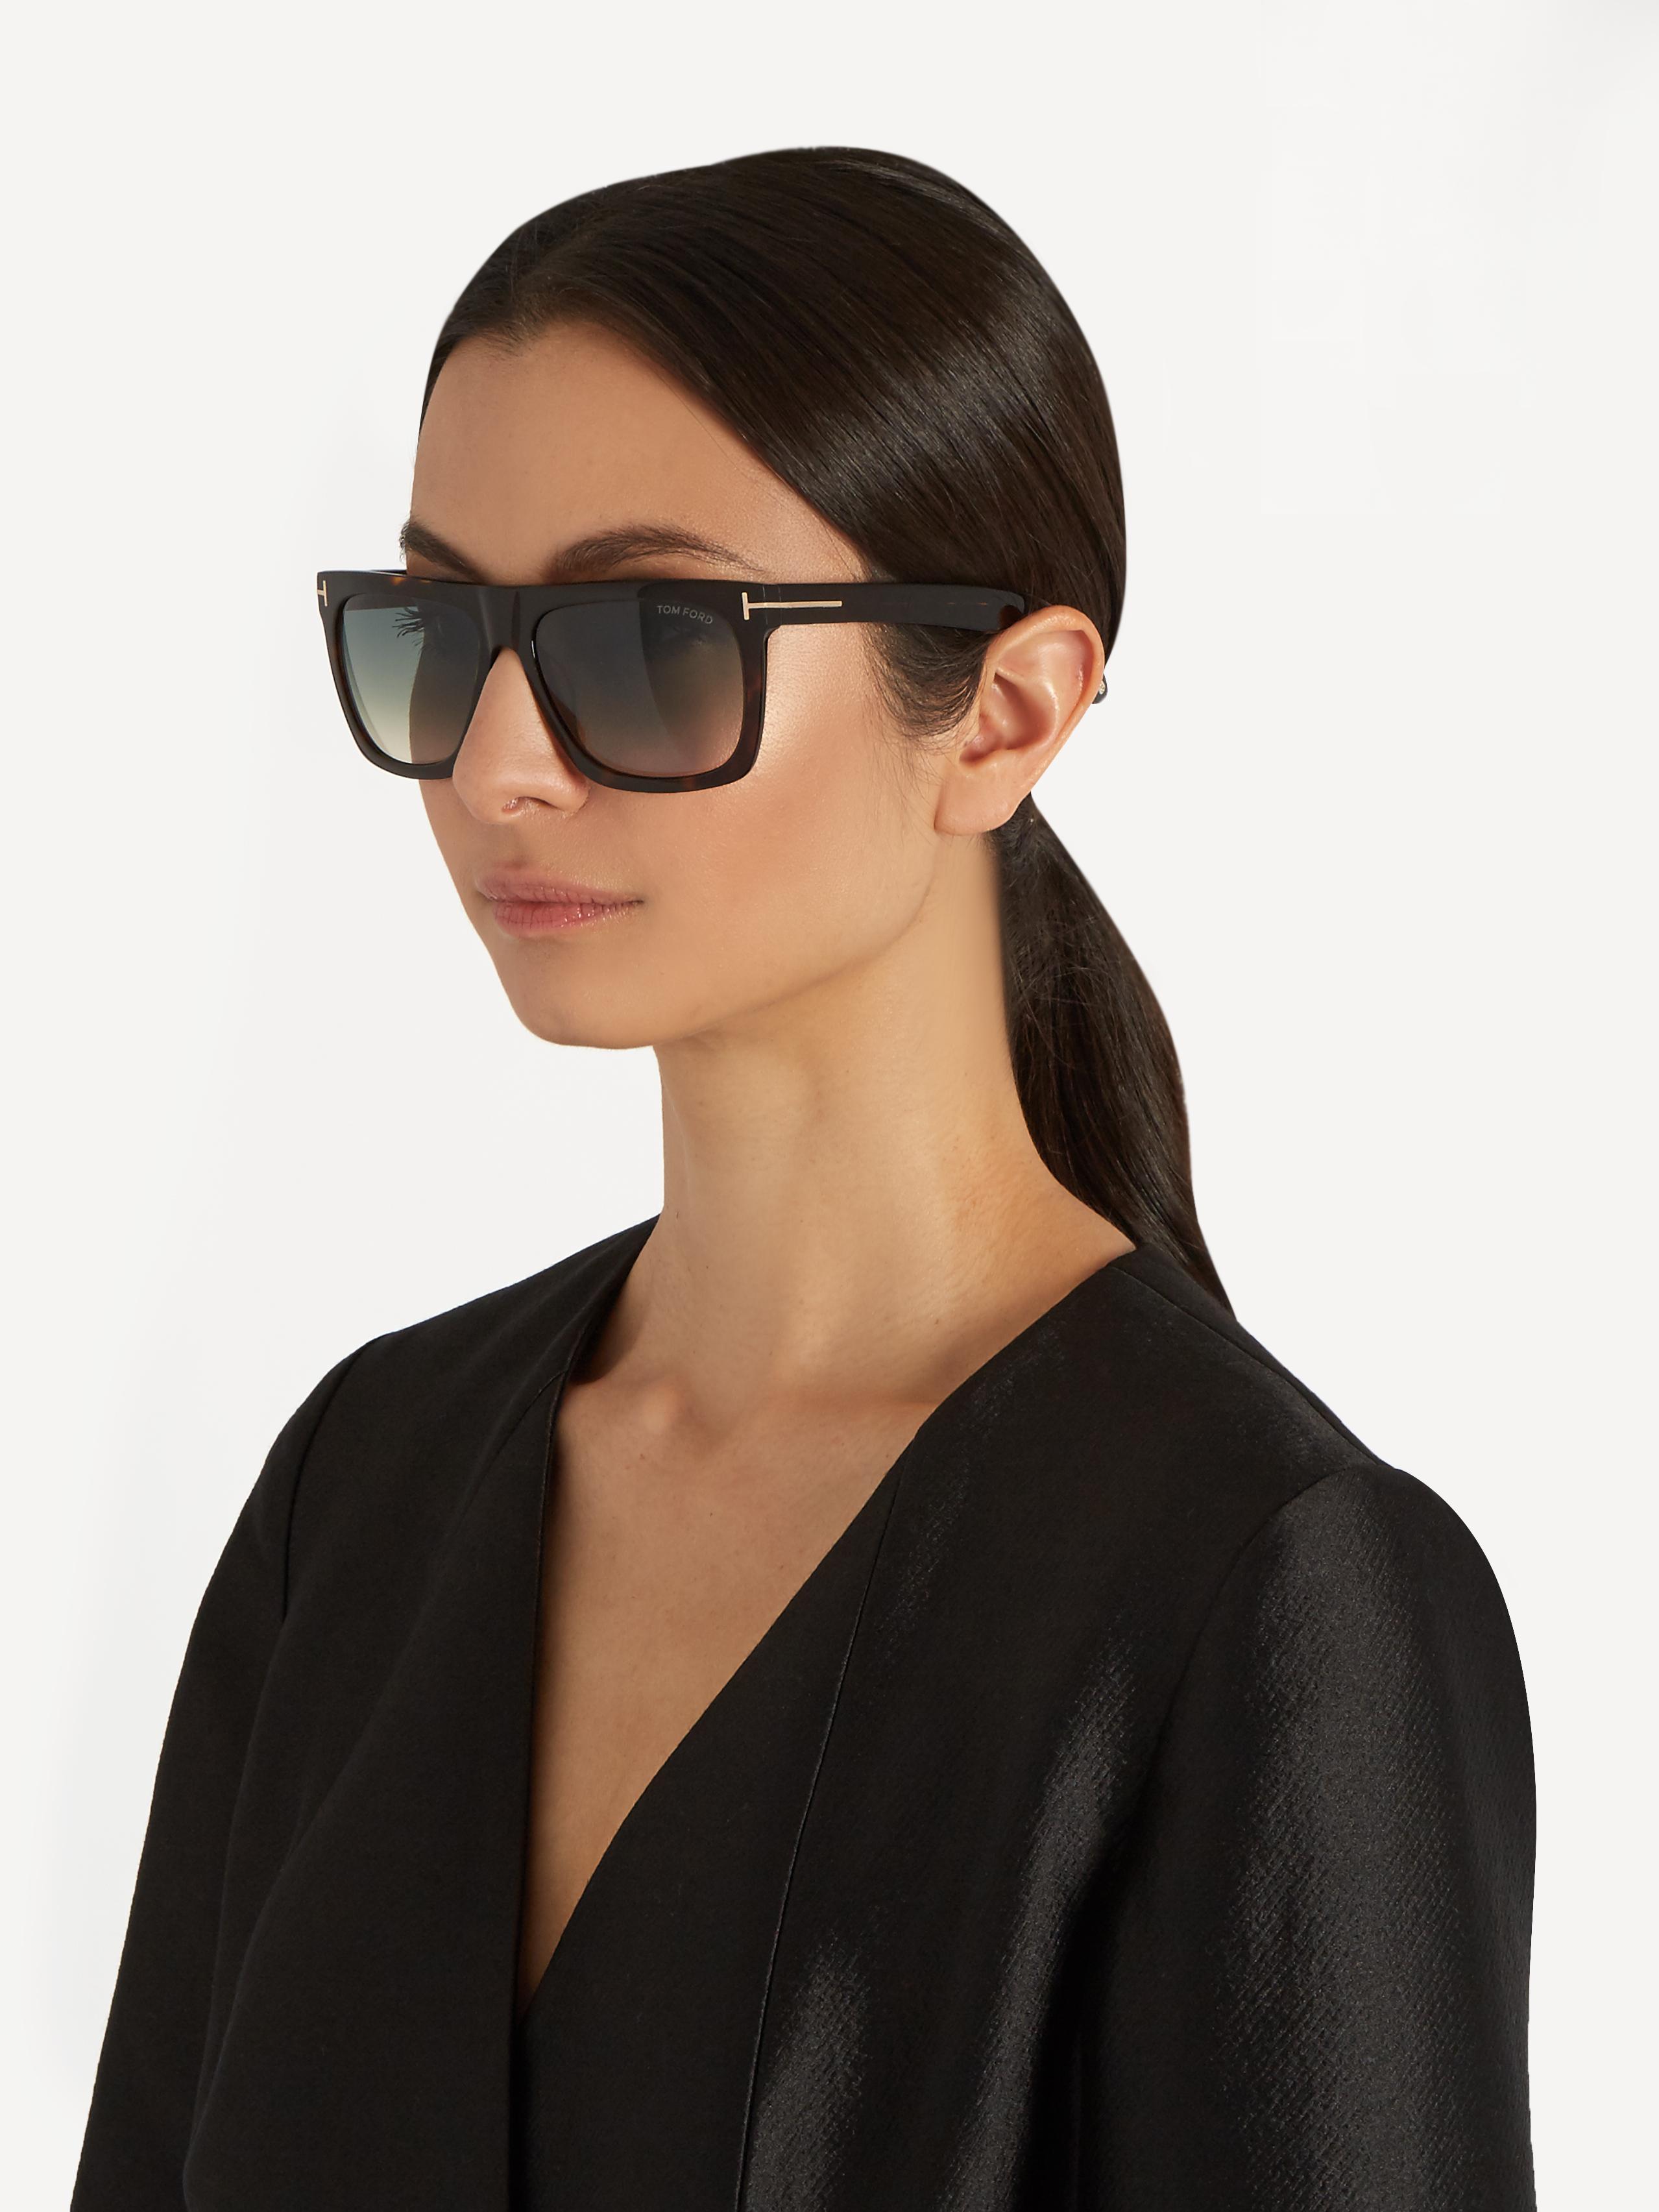 Lyst - Tom Ford Morgan Flat-top Sunglasses in Brown Tom Ford Eyewear Logo